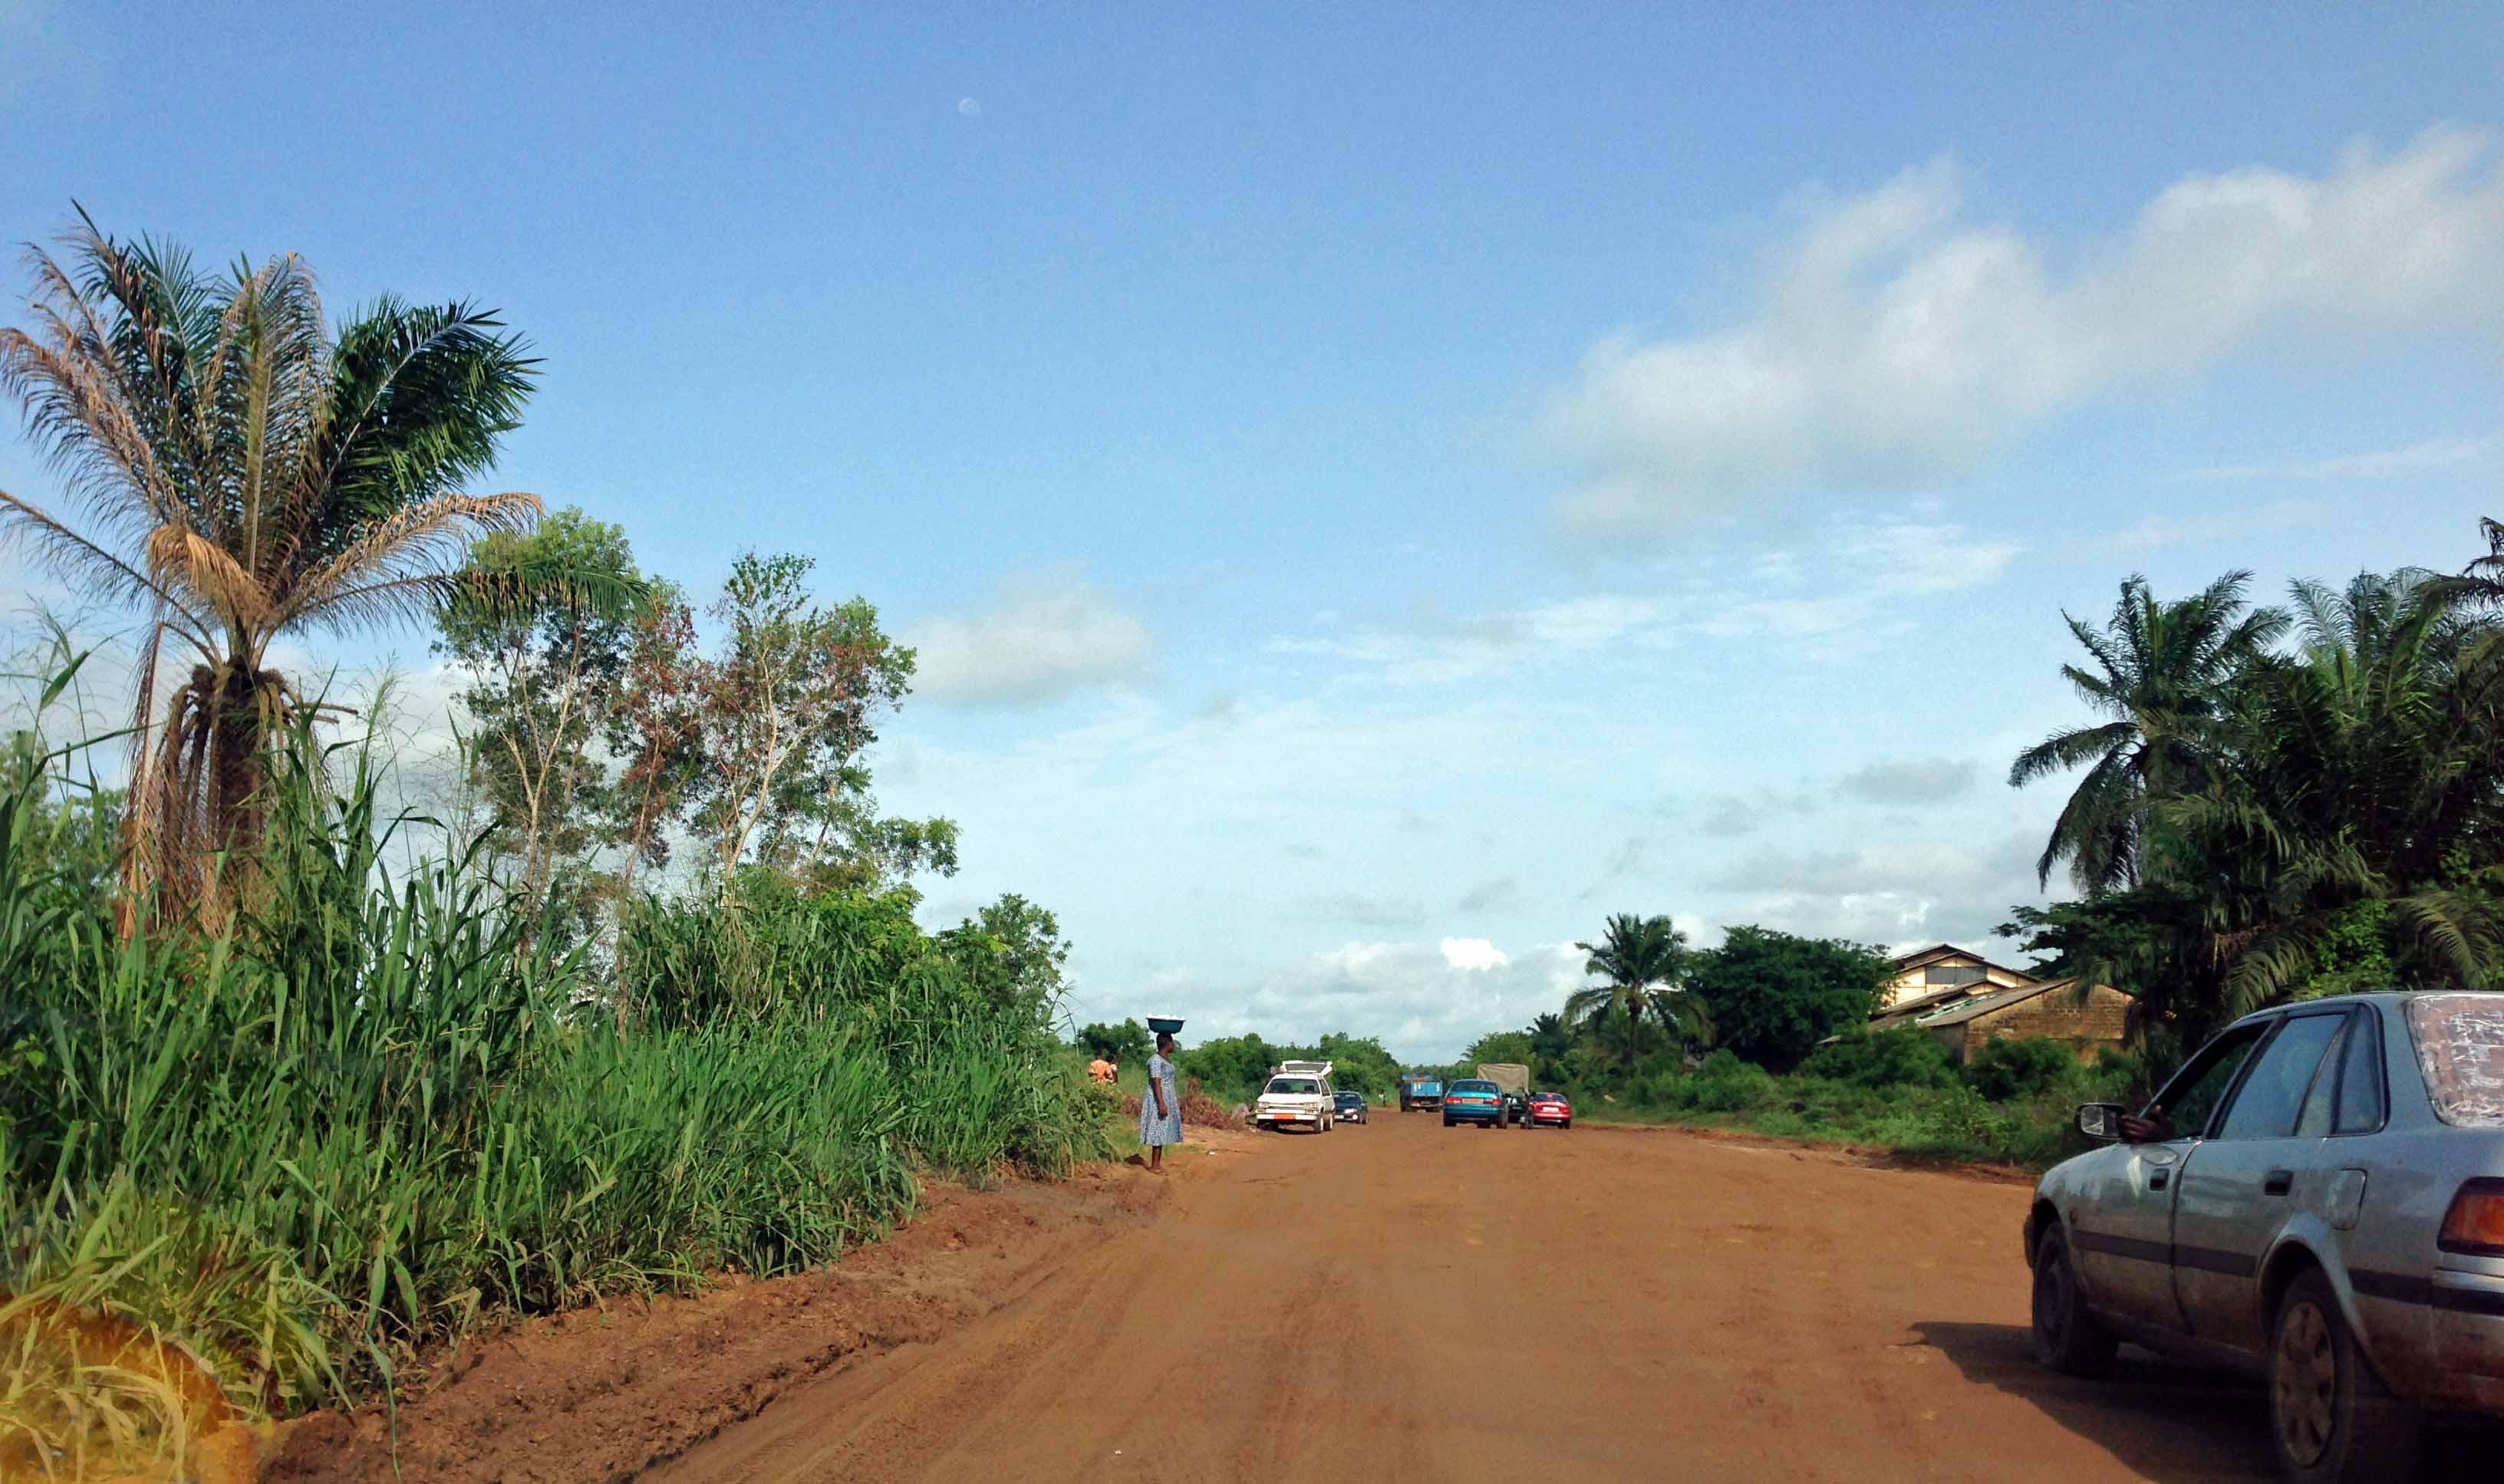 Benin - Togo Road